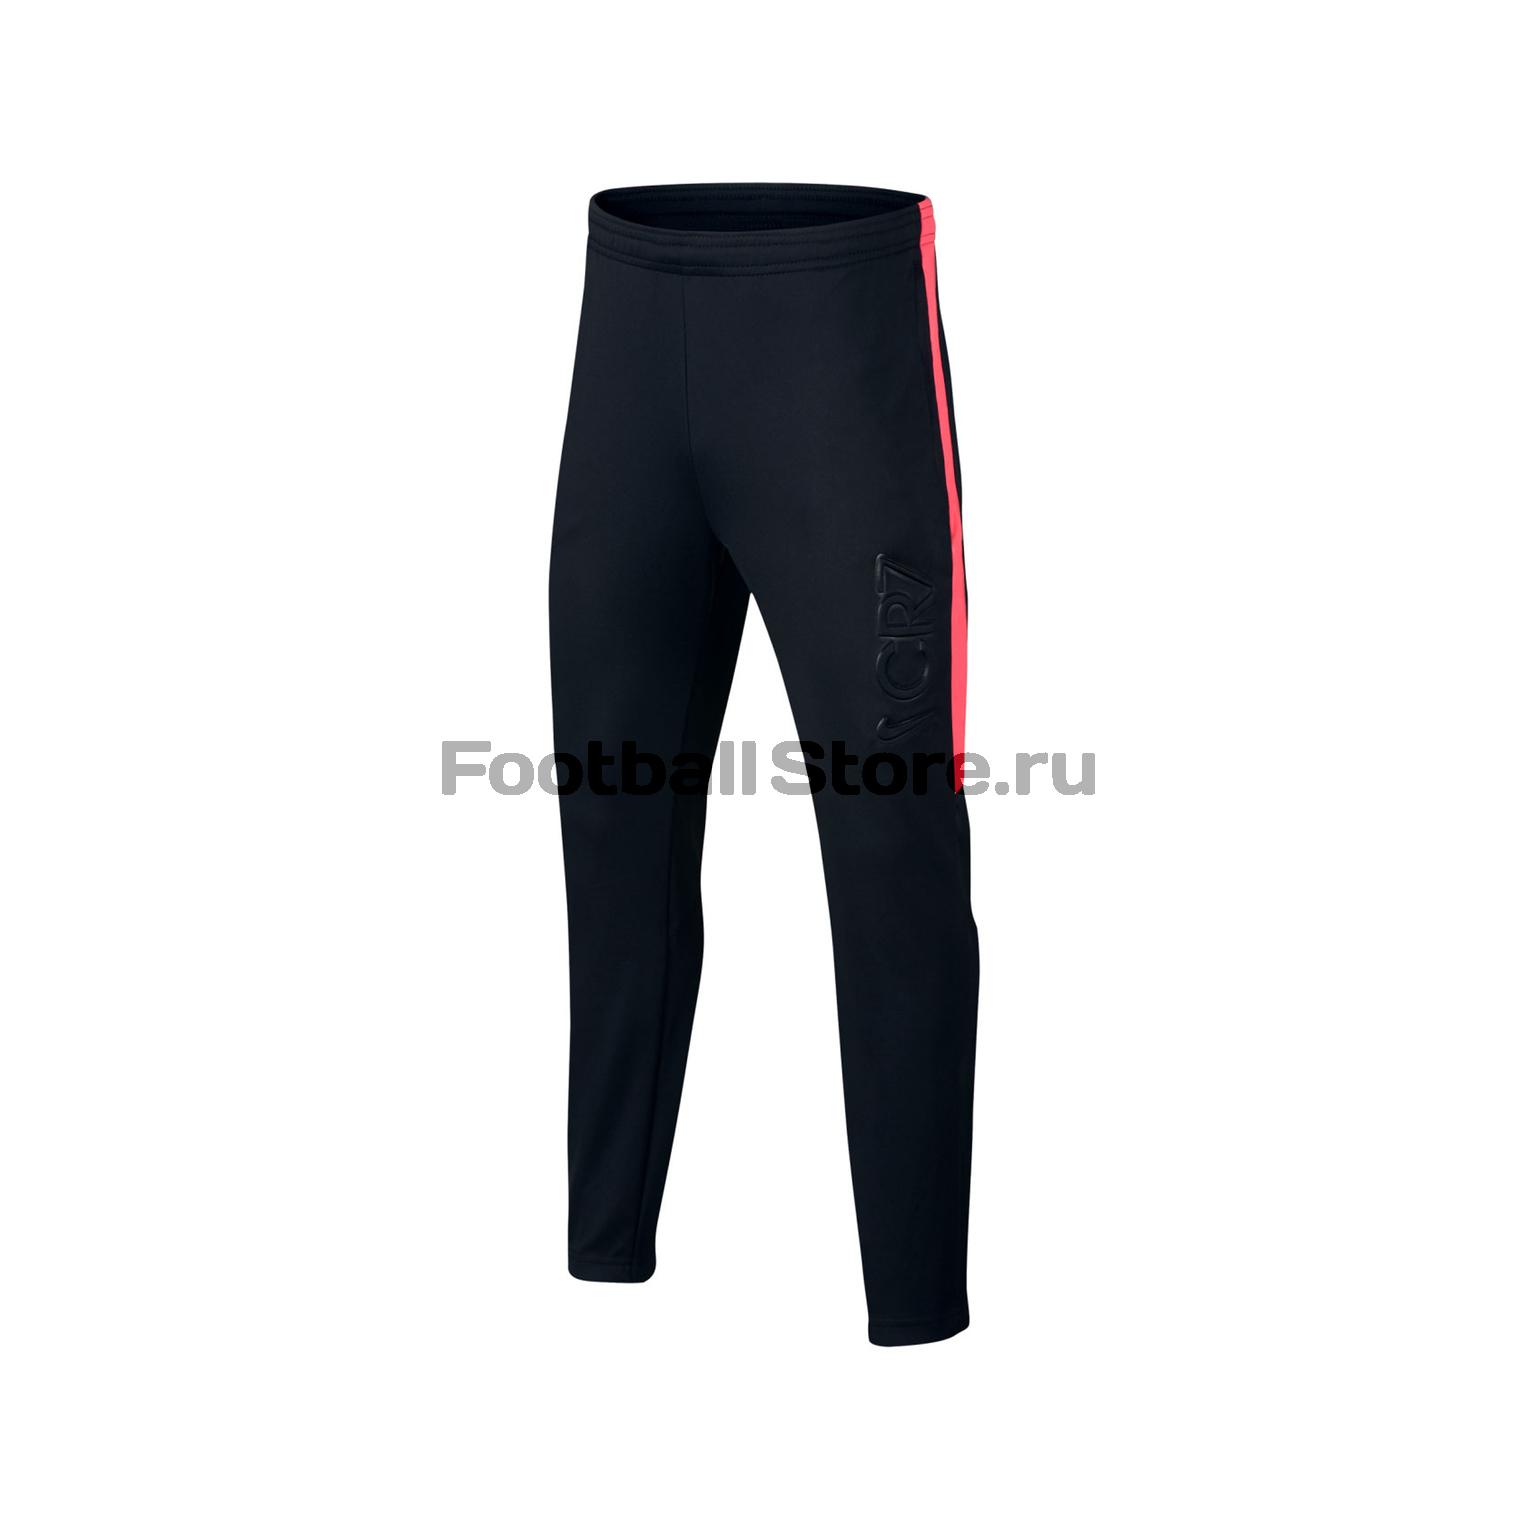 Брюки подростковые Nike CR7 Dry Pant AA9891-010 фанатская атрибутика nike cr7